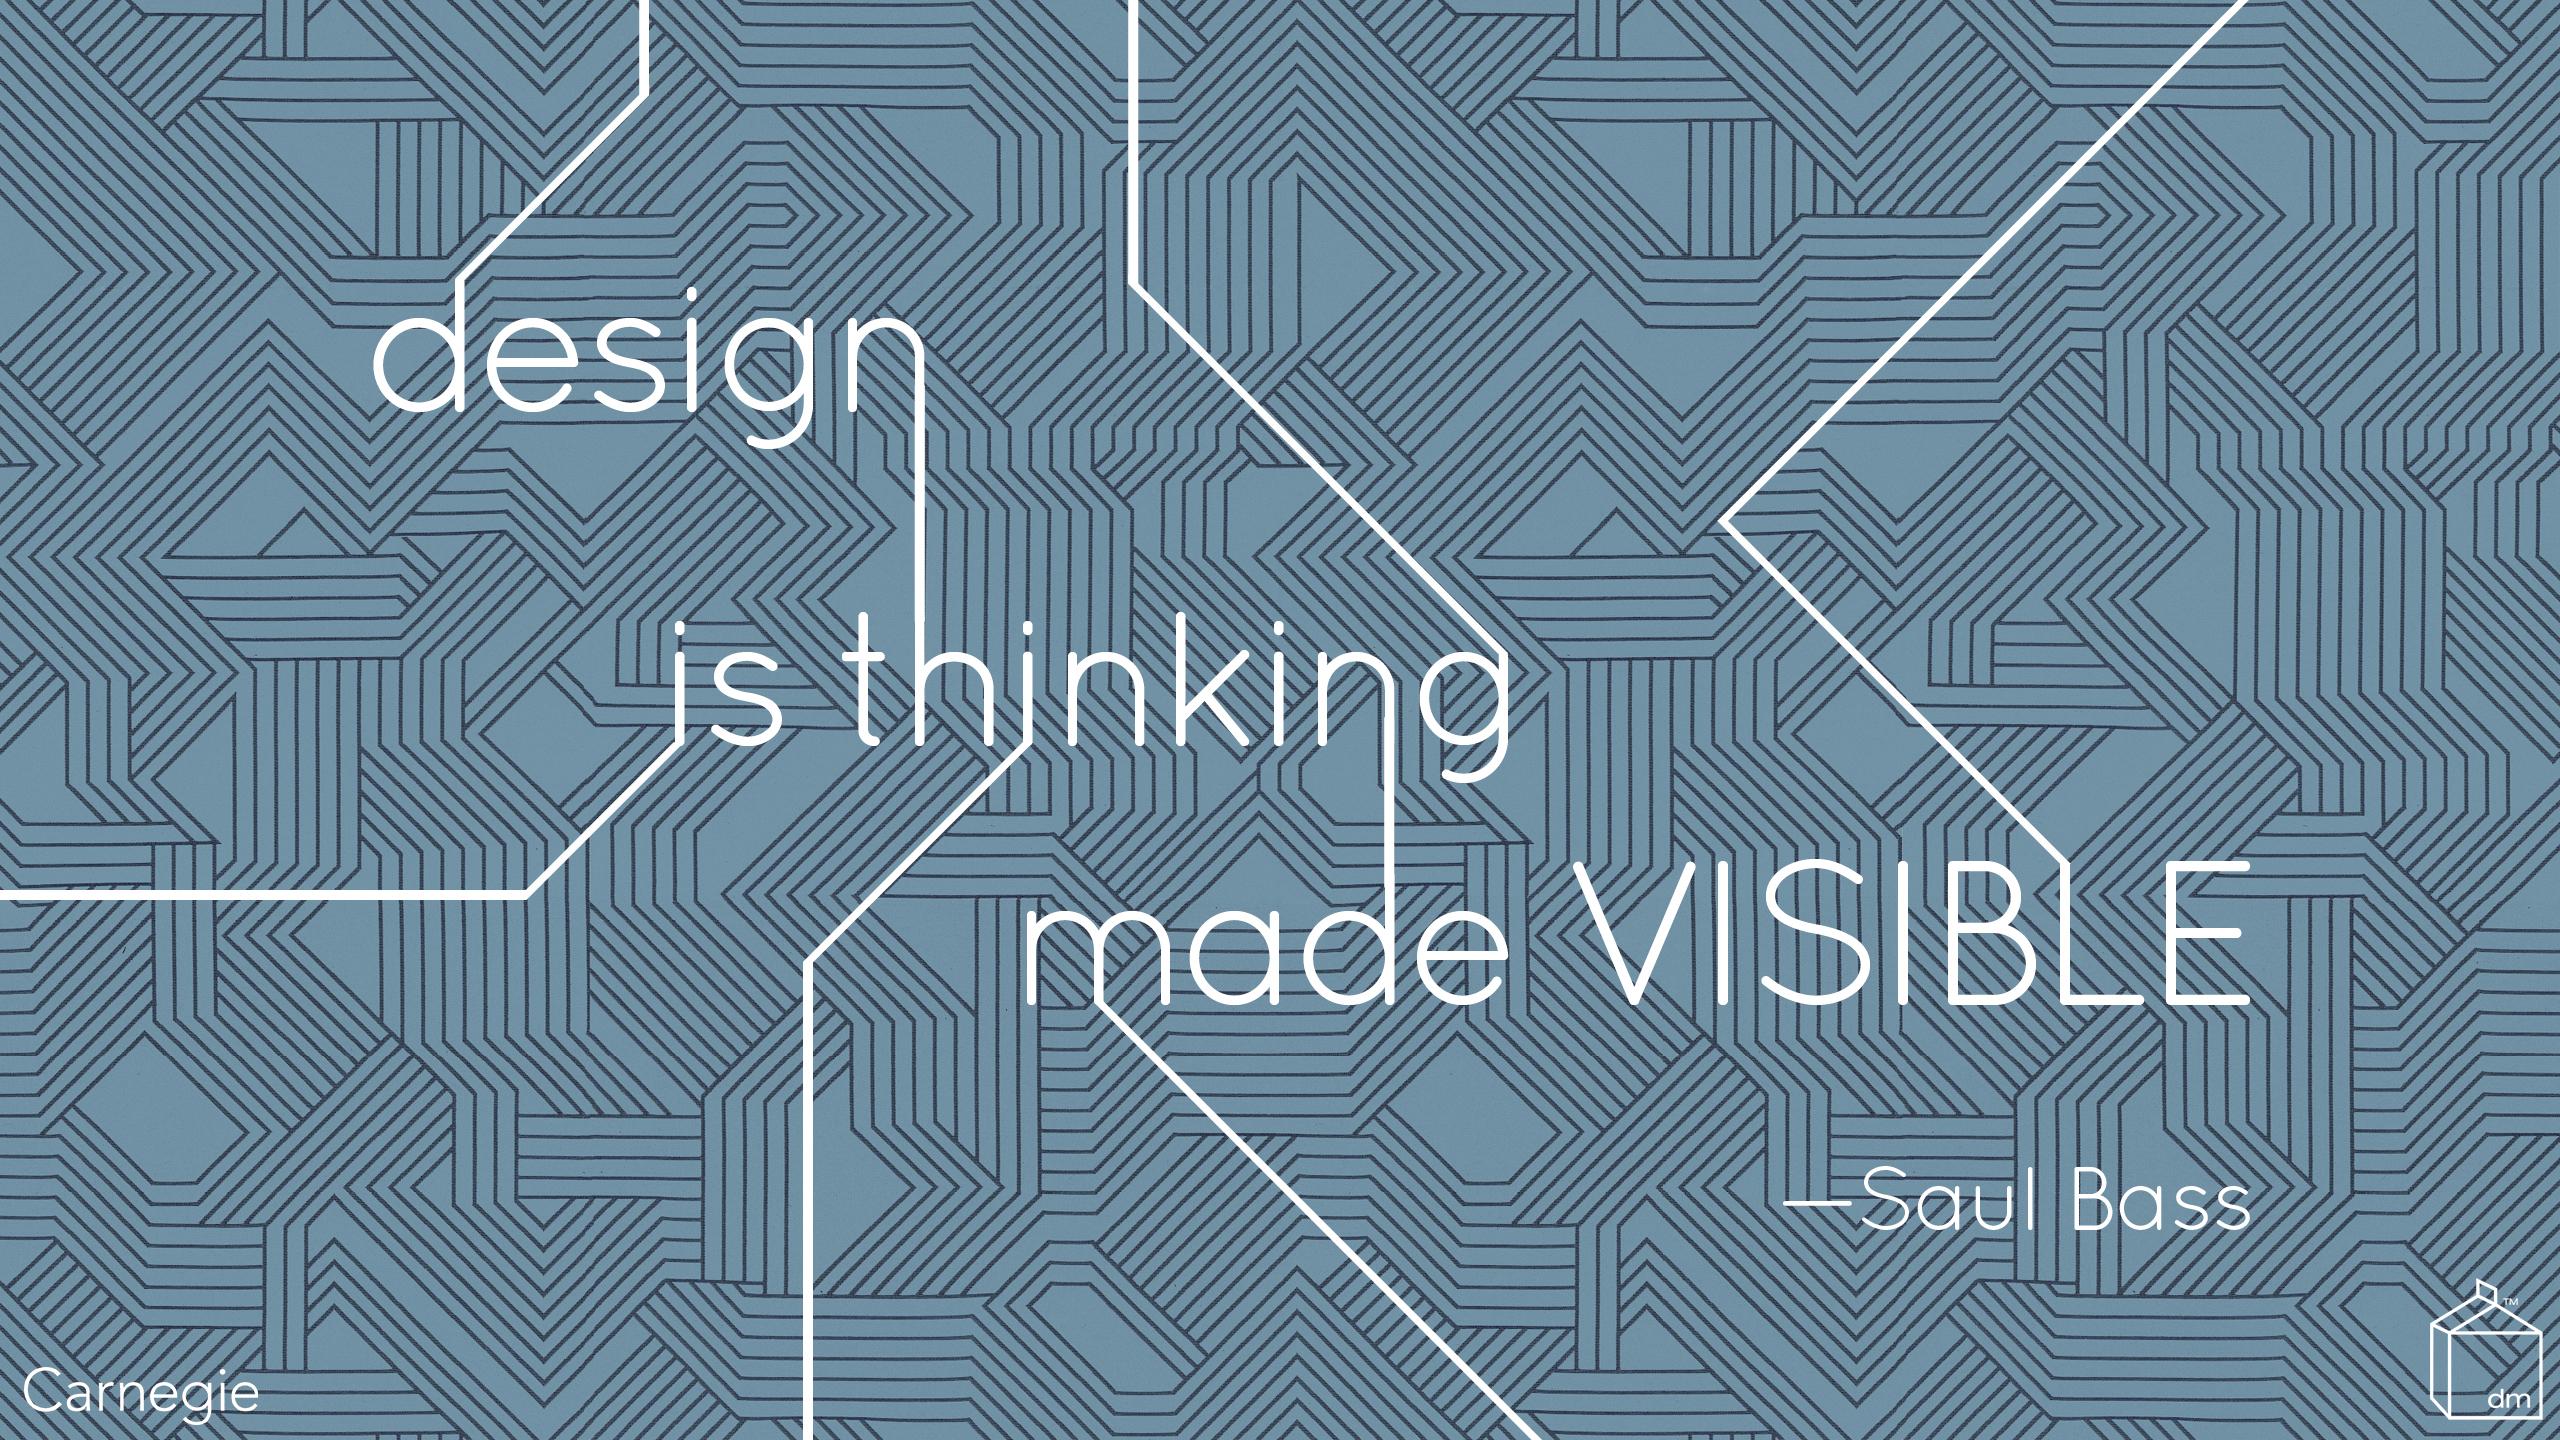 View and download past Designer Desktops here 2560x1440